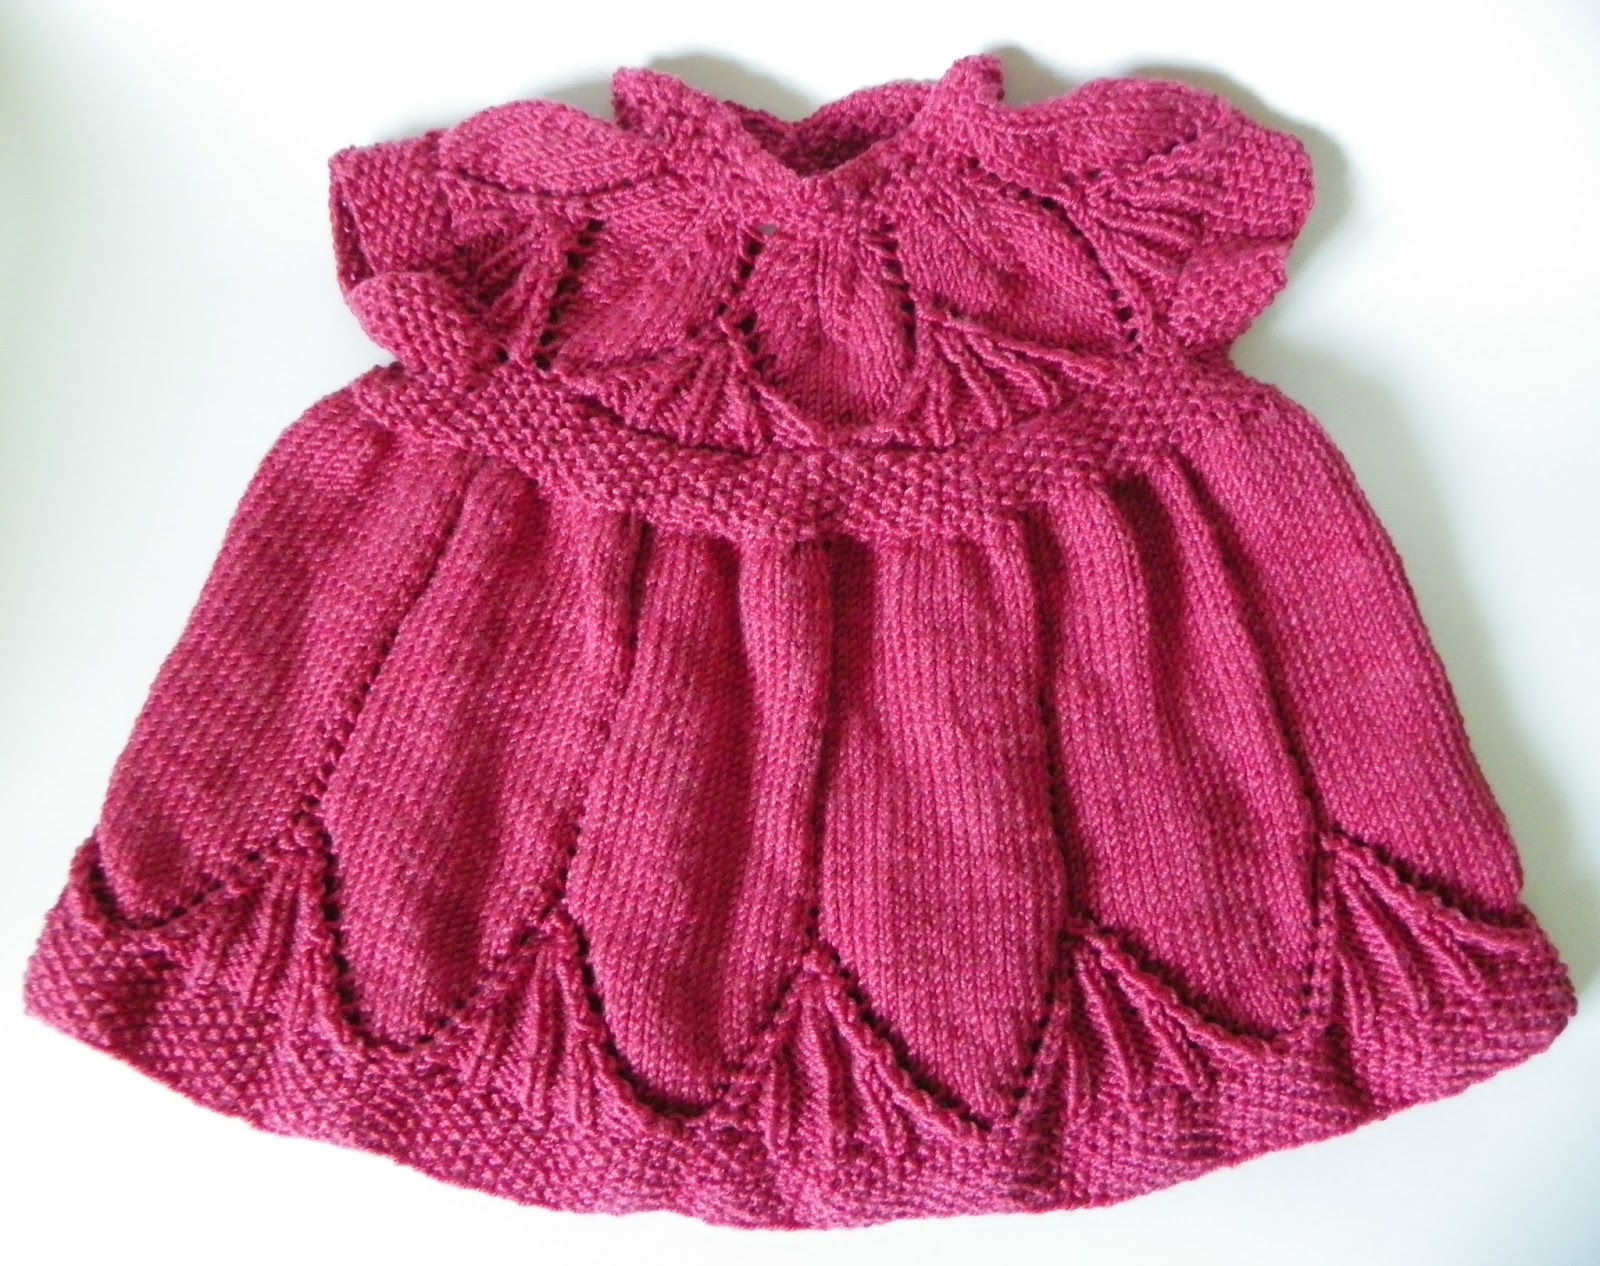 Clara Dress Knitting Pattern : Lazy Days and Sundays: Clara dress